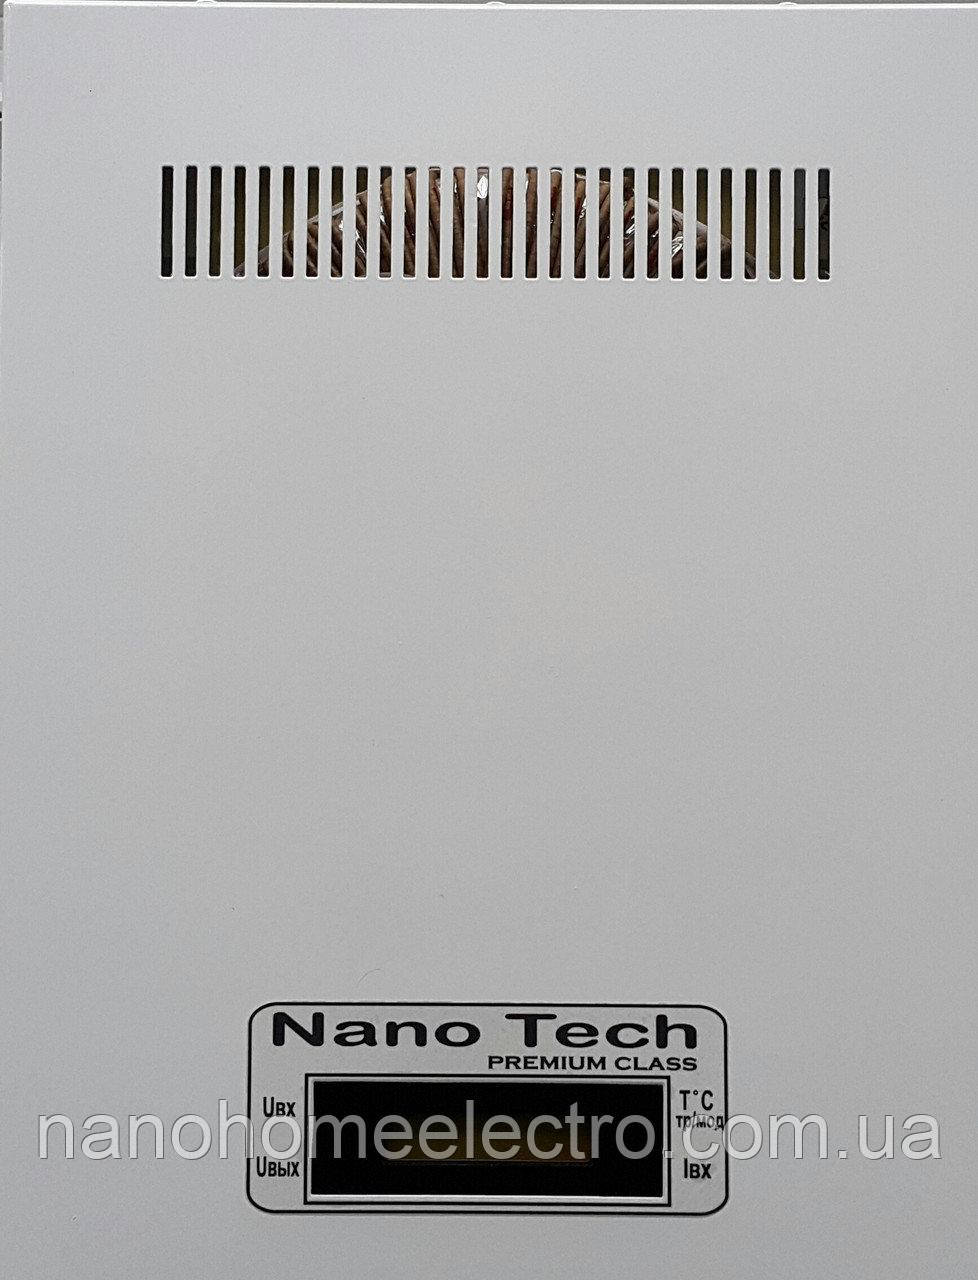 Стабилизатор напряжения 15 квт PRO Премиум NanoTech